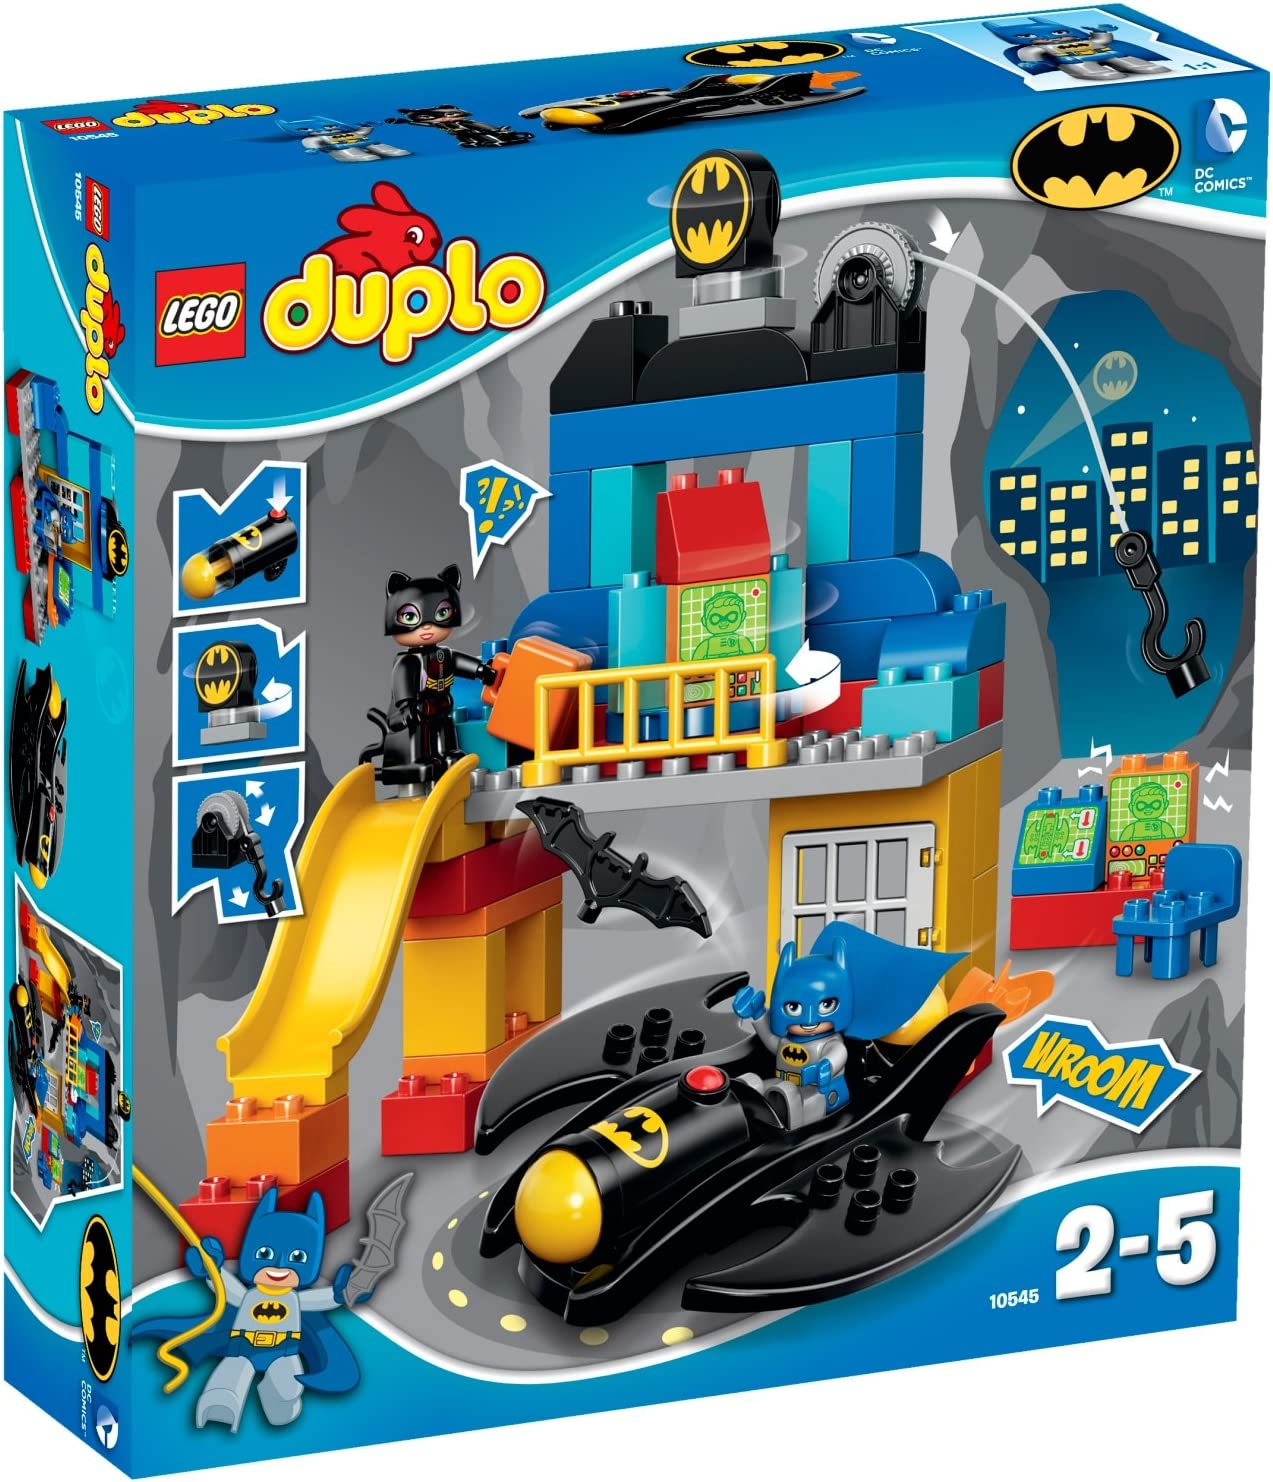 LEGO DUPLO Super Heroes 10545 Adventure Buildin Batcave Large discharge sale Piece 59 Finally resale start